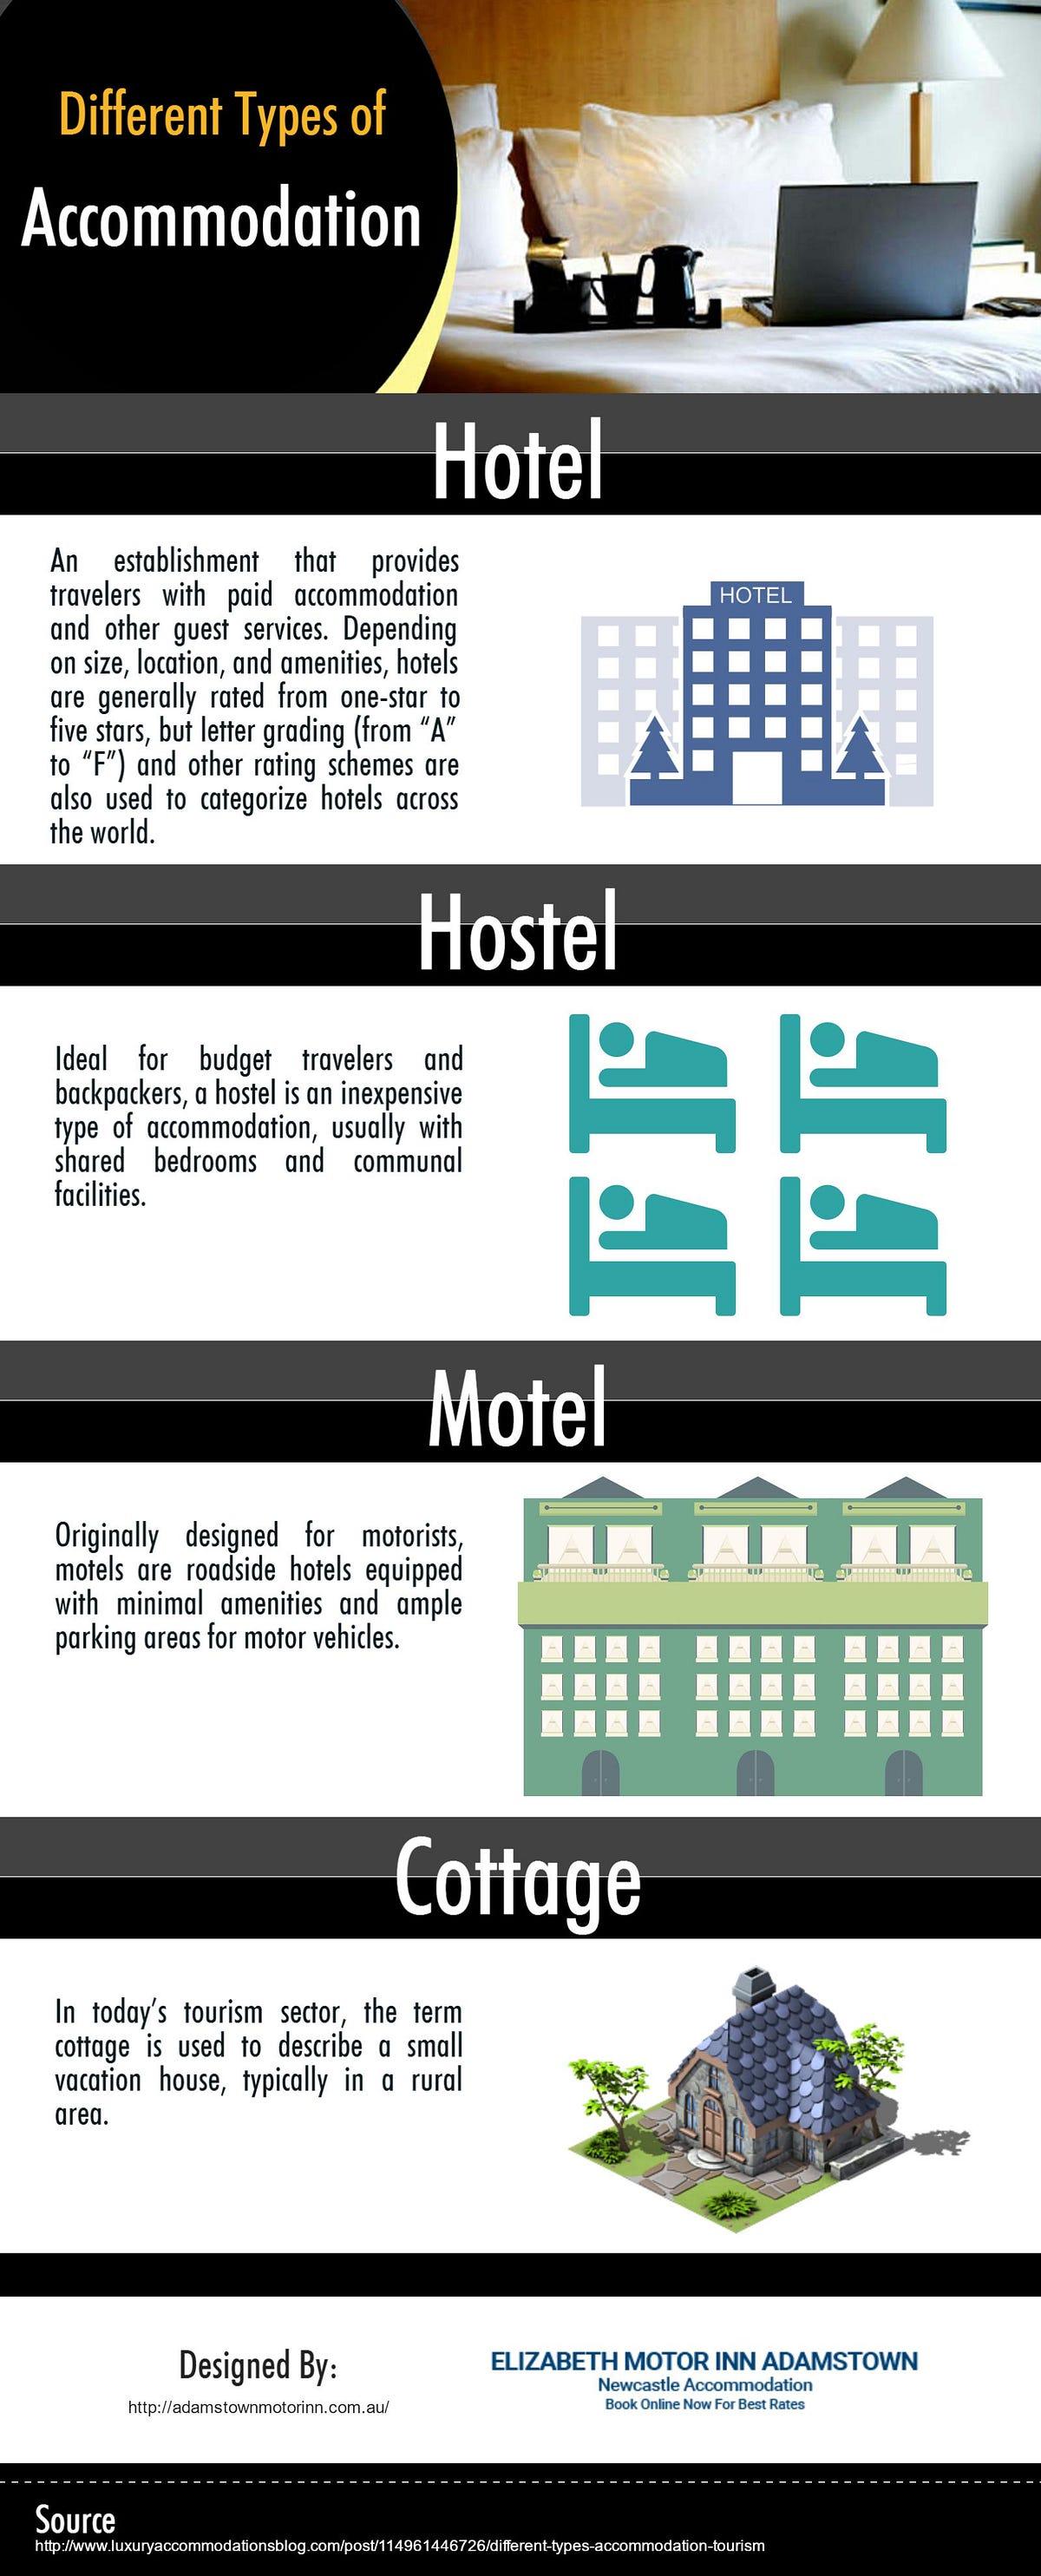 Different Types of Accommodation  AngusBright  Medium